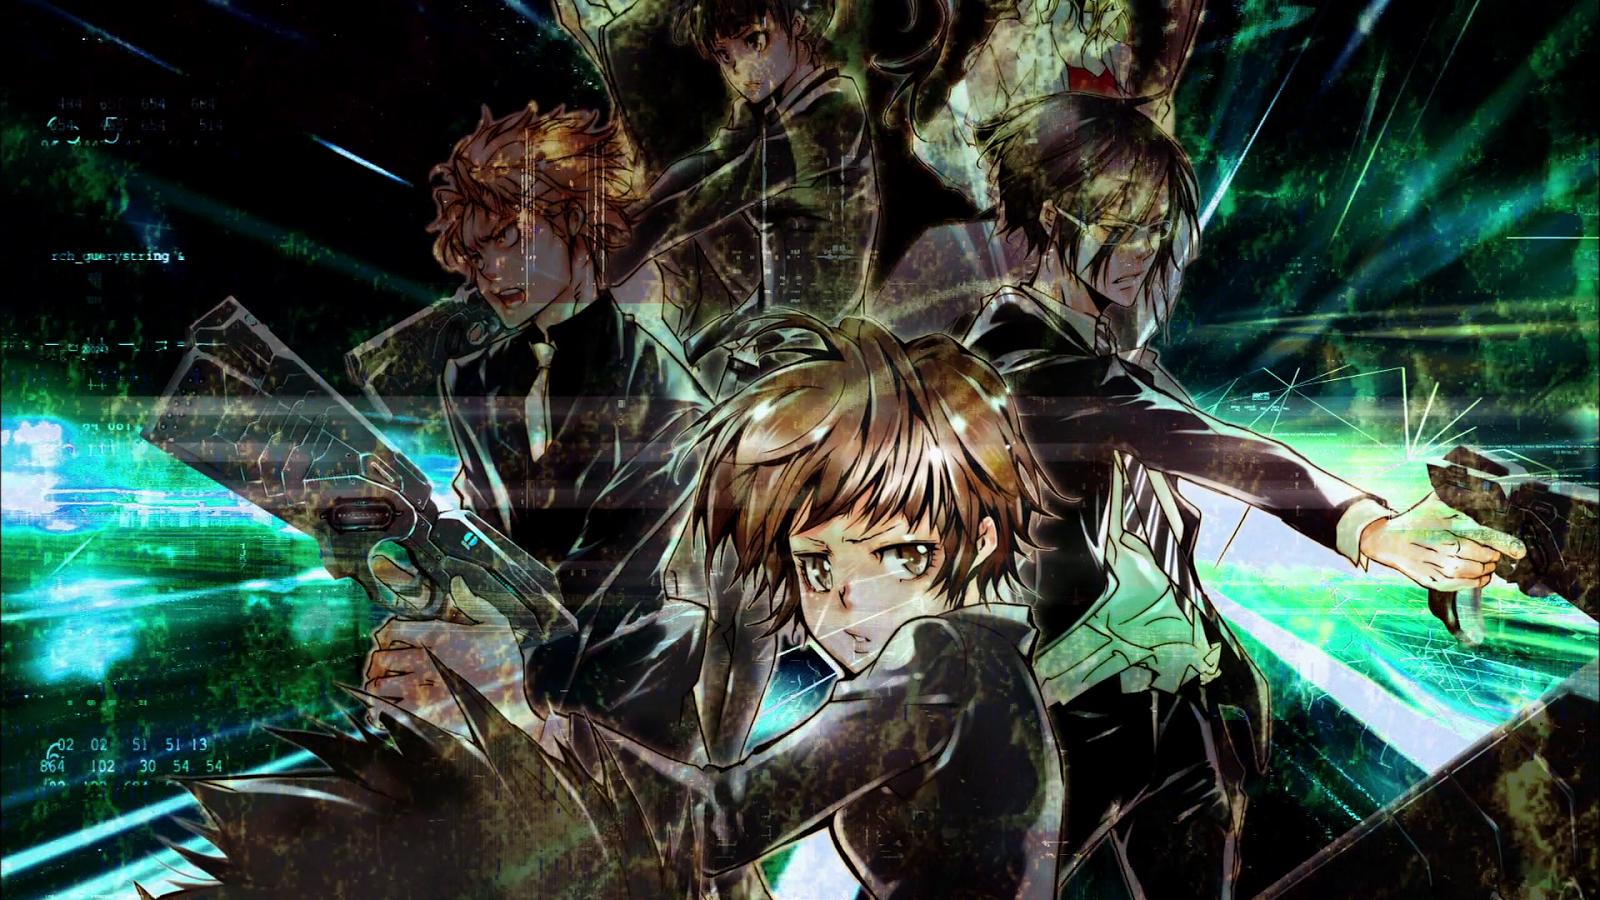 Anime Wallpapers Psycho Pass   Anime Wallpaper 1600x900